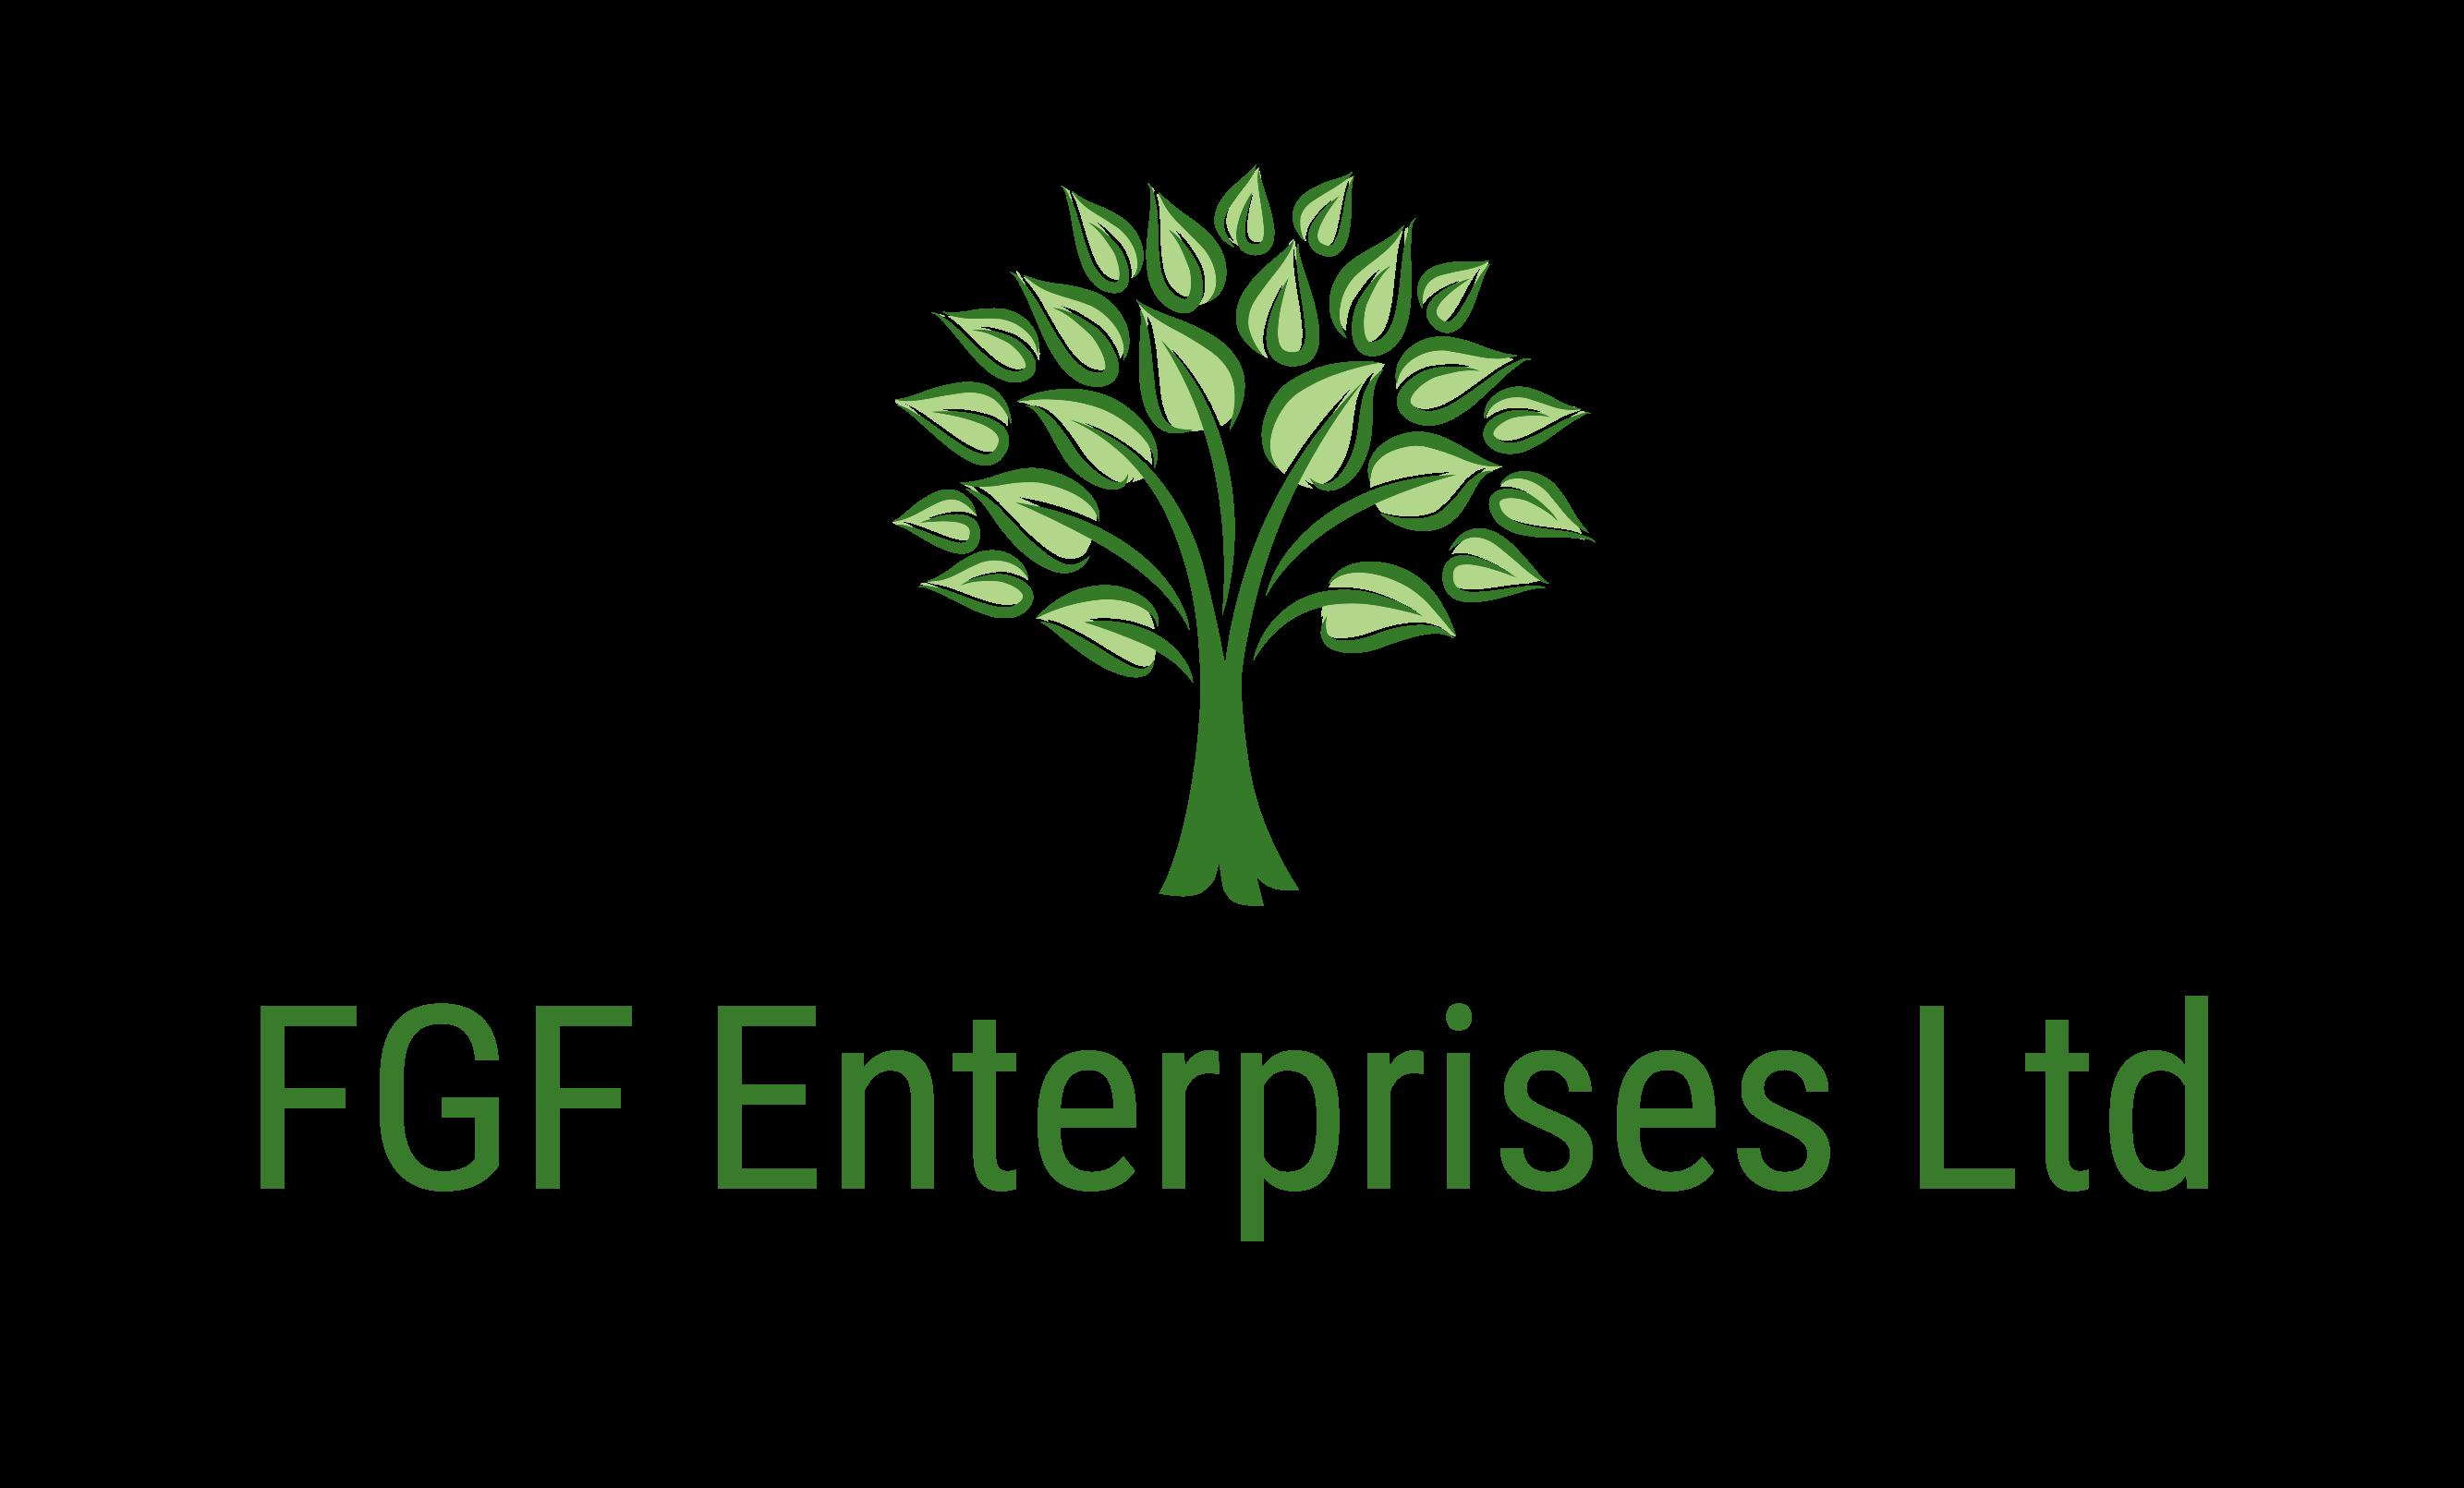 FGF Enterprises Ltd